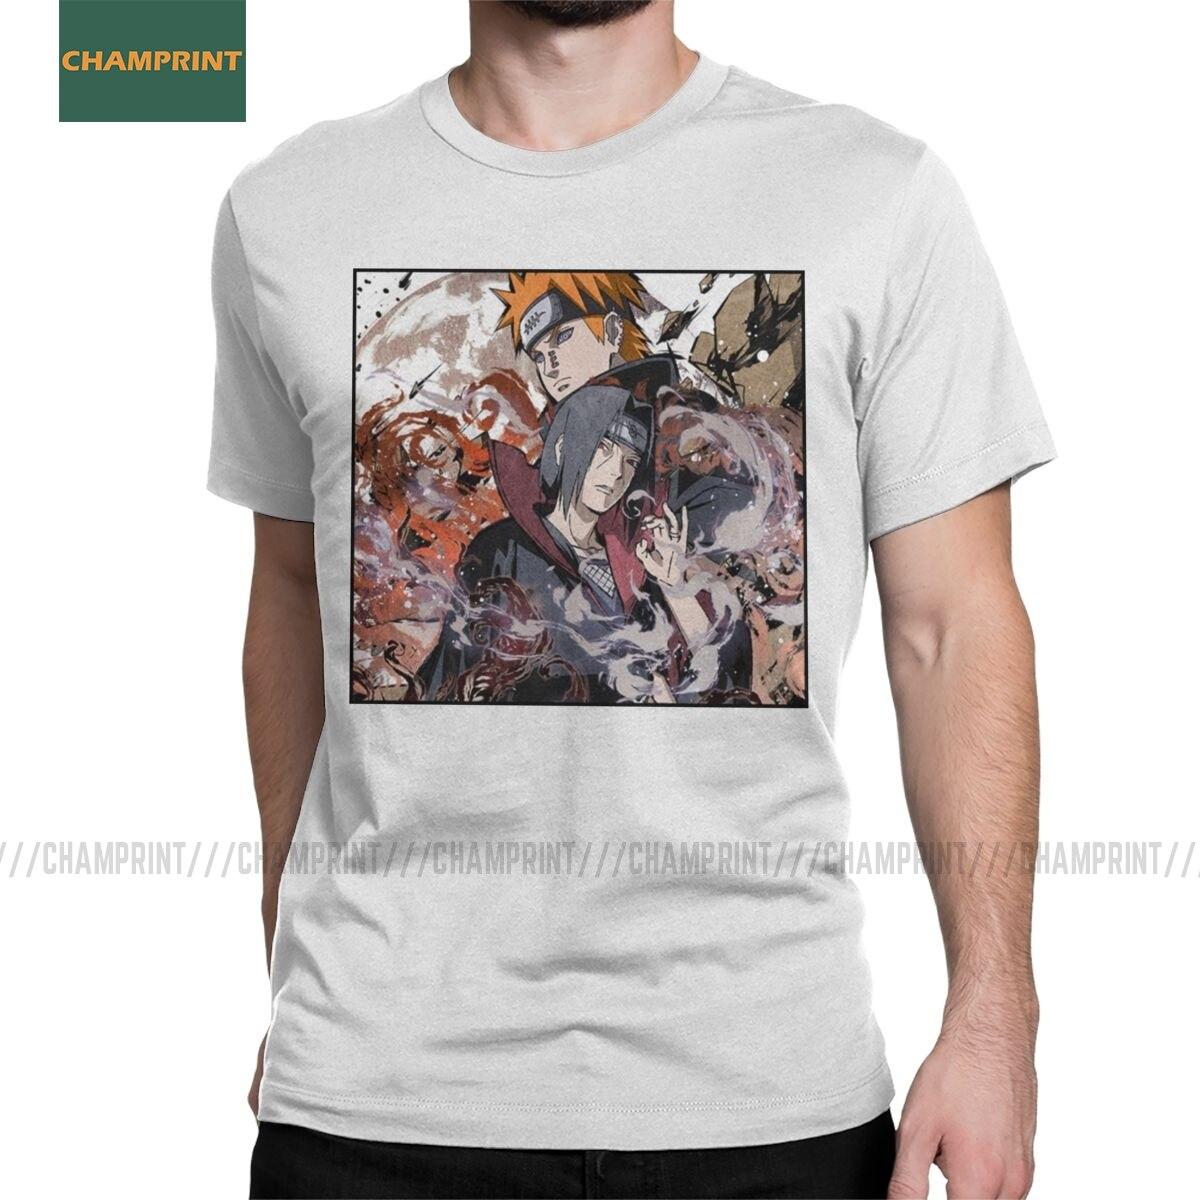 Hombres A Painful Hatred Naruto camisetas Akatsuki Pein Anime Itachi Uchiha Sasuke camisetas de algodón de manga corta Tee regalo Idea camiseta